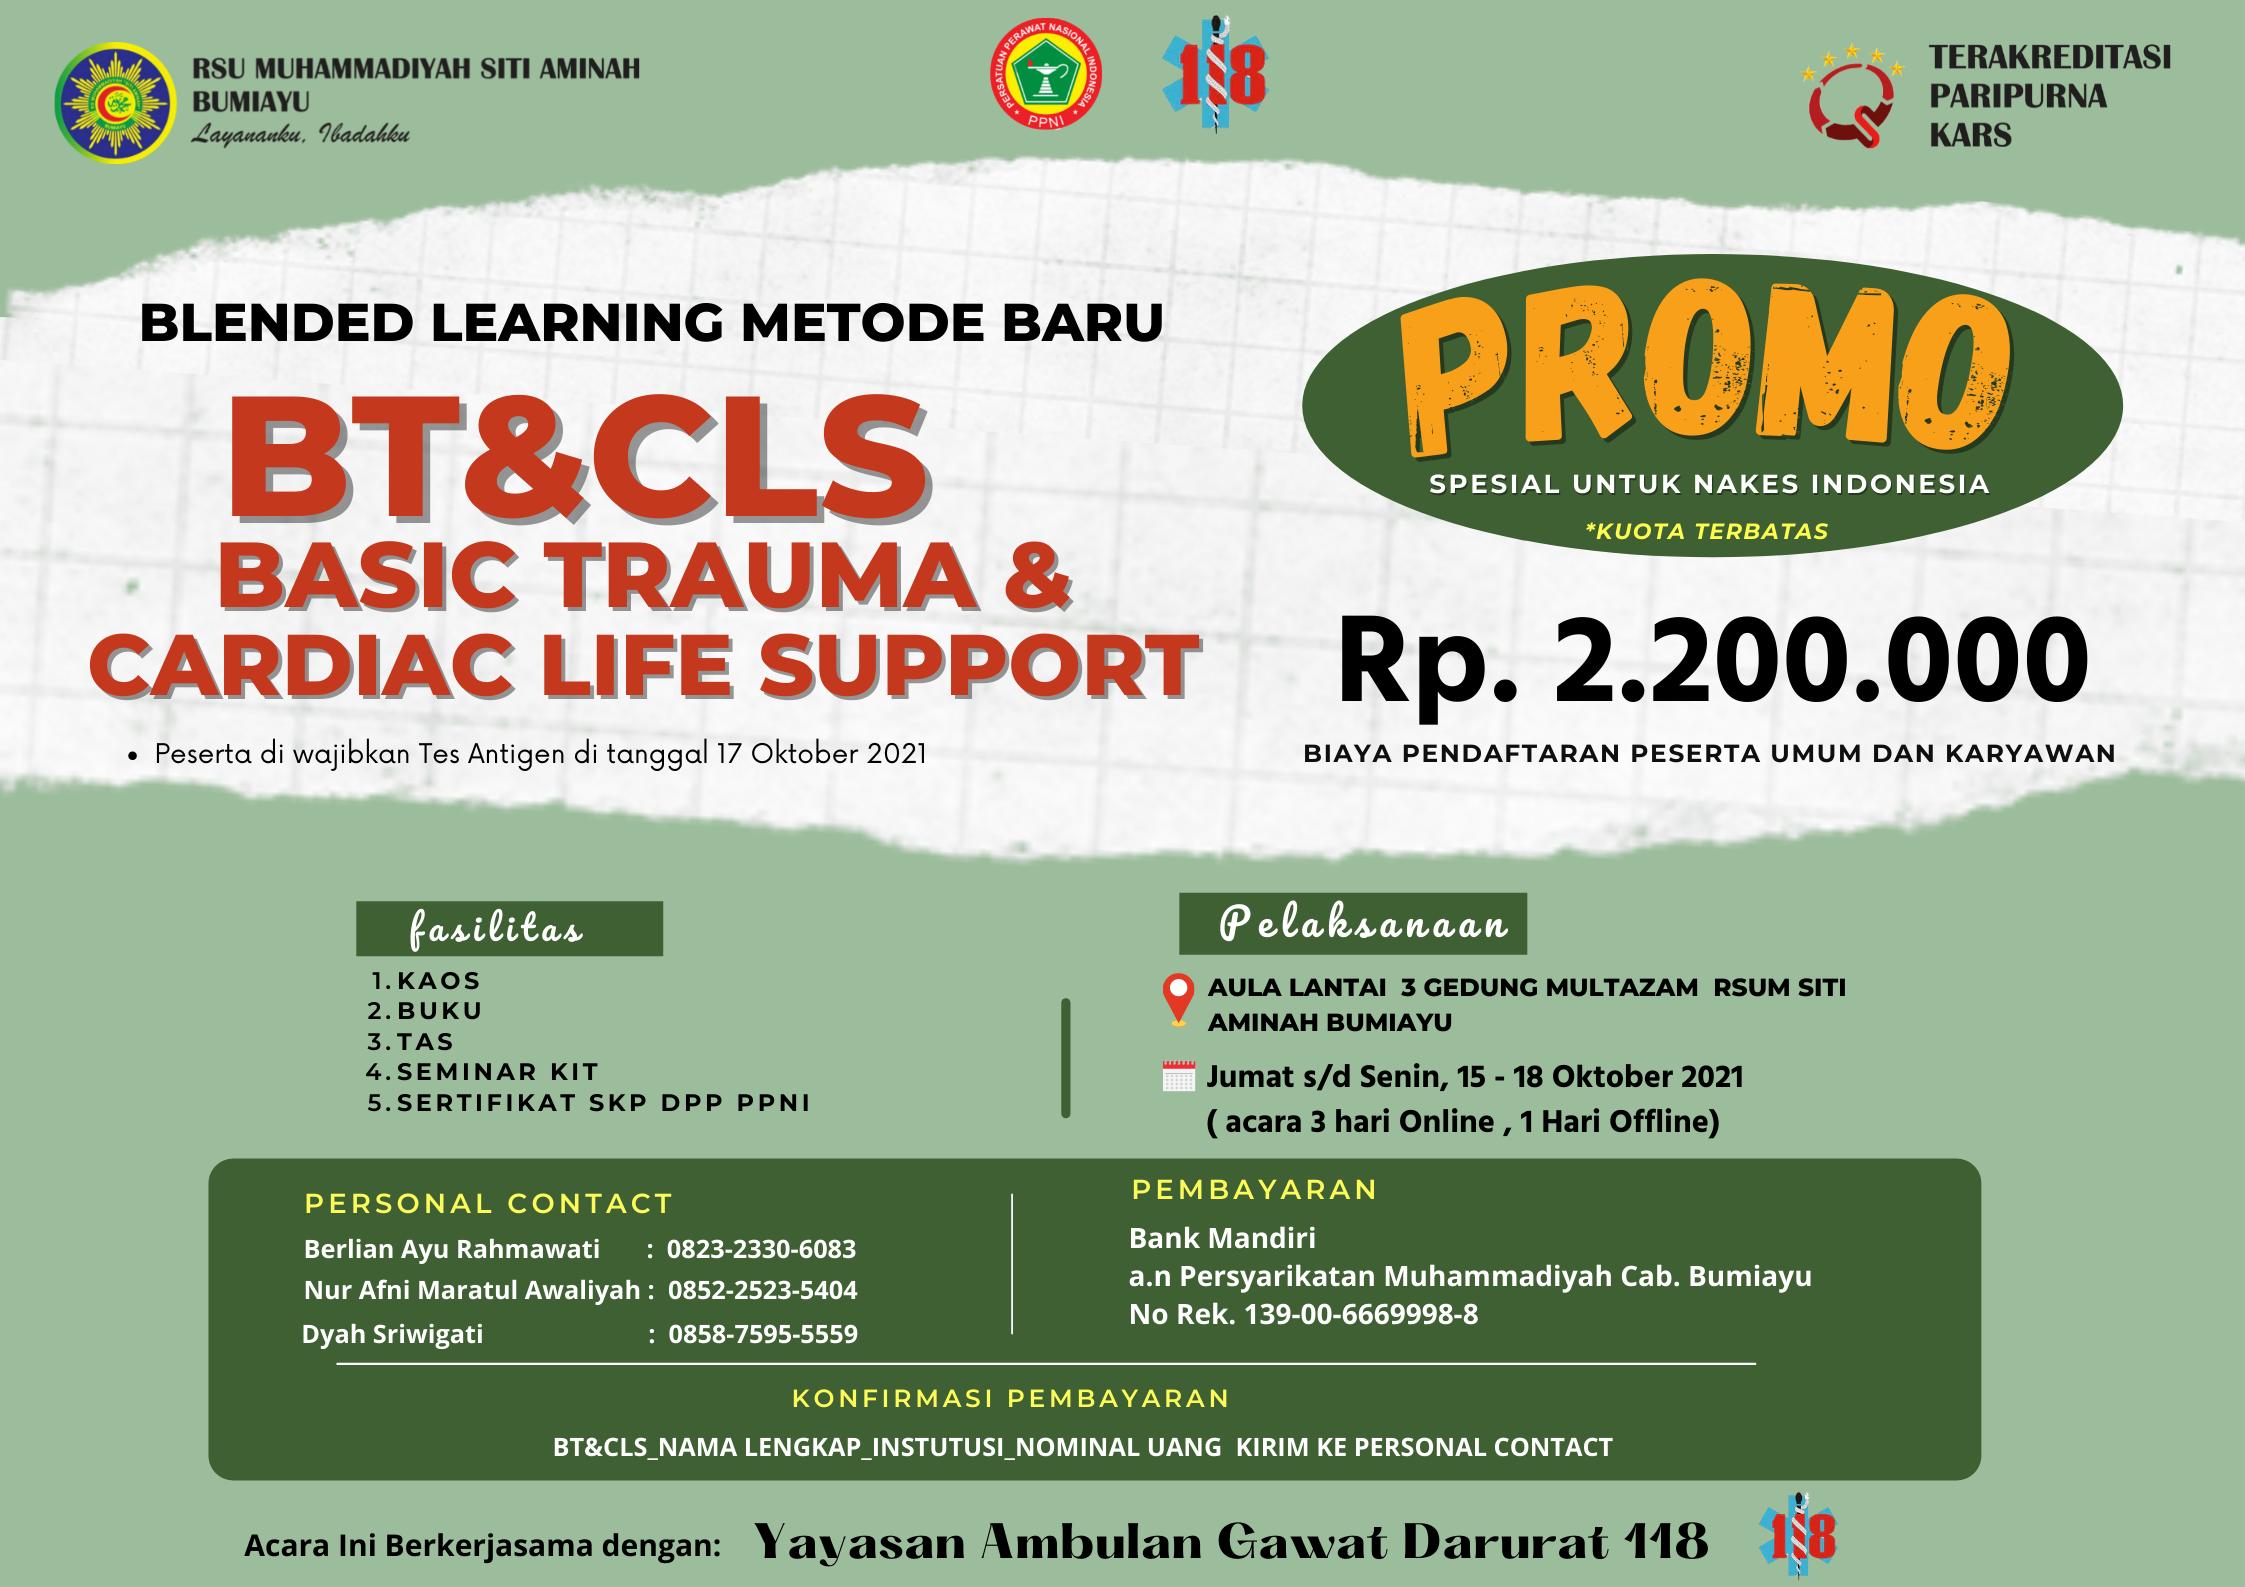 Acara Blended Learning Metode baru BT & CLS Basic Trauma & Cardiac Life Support